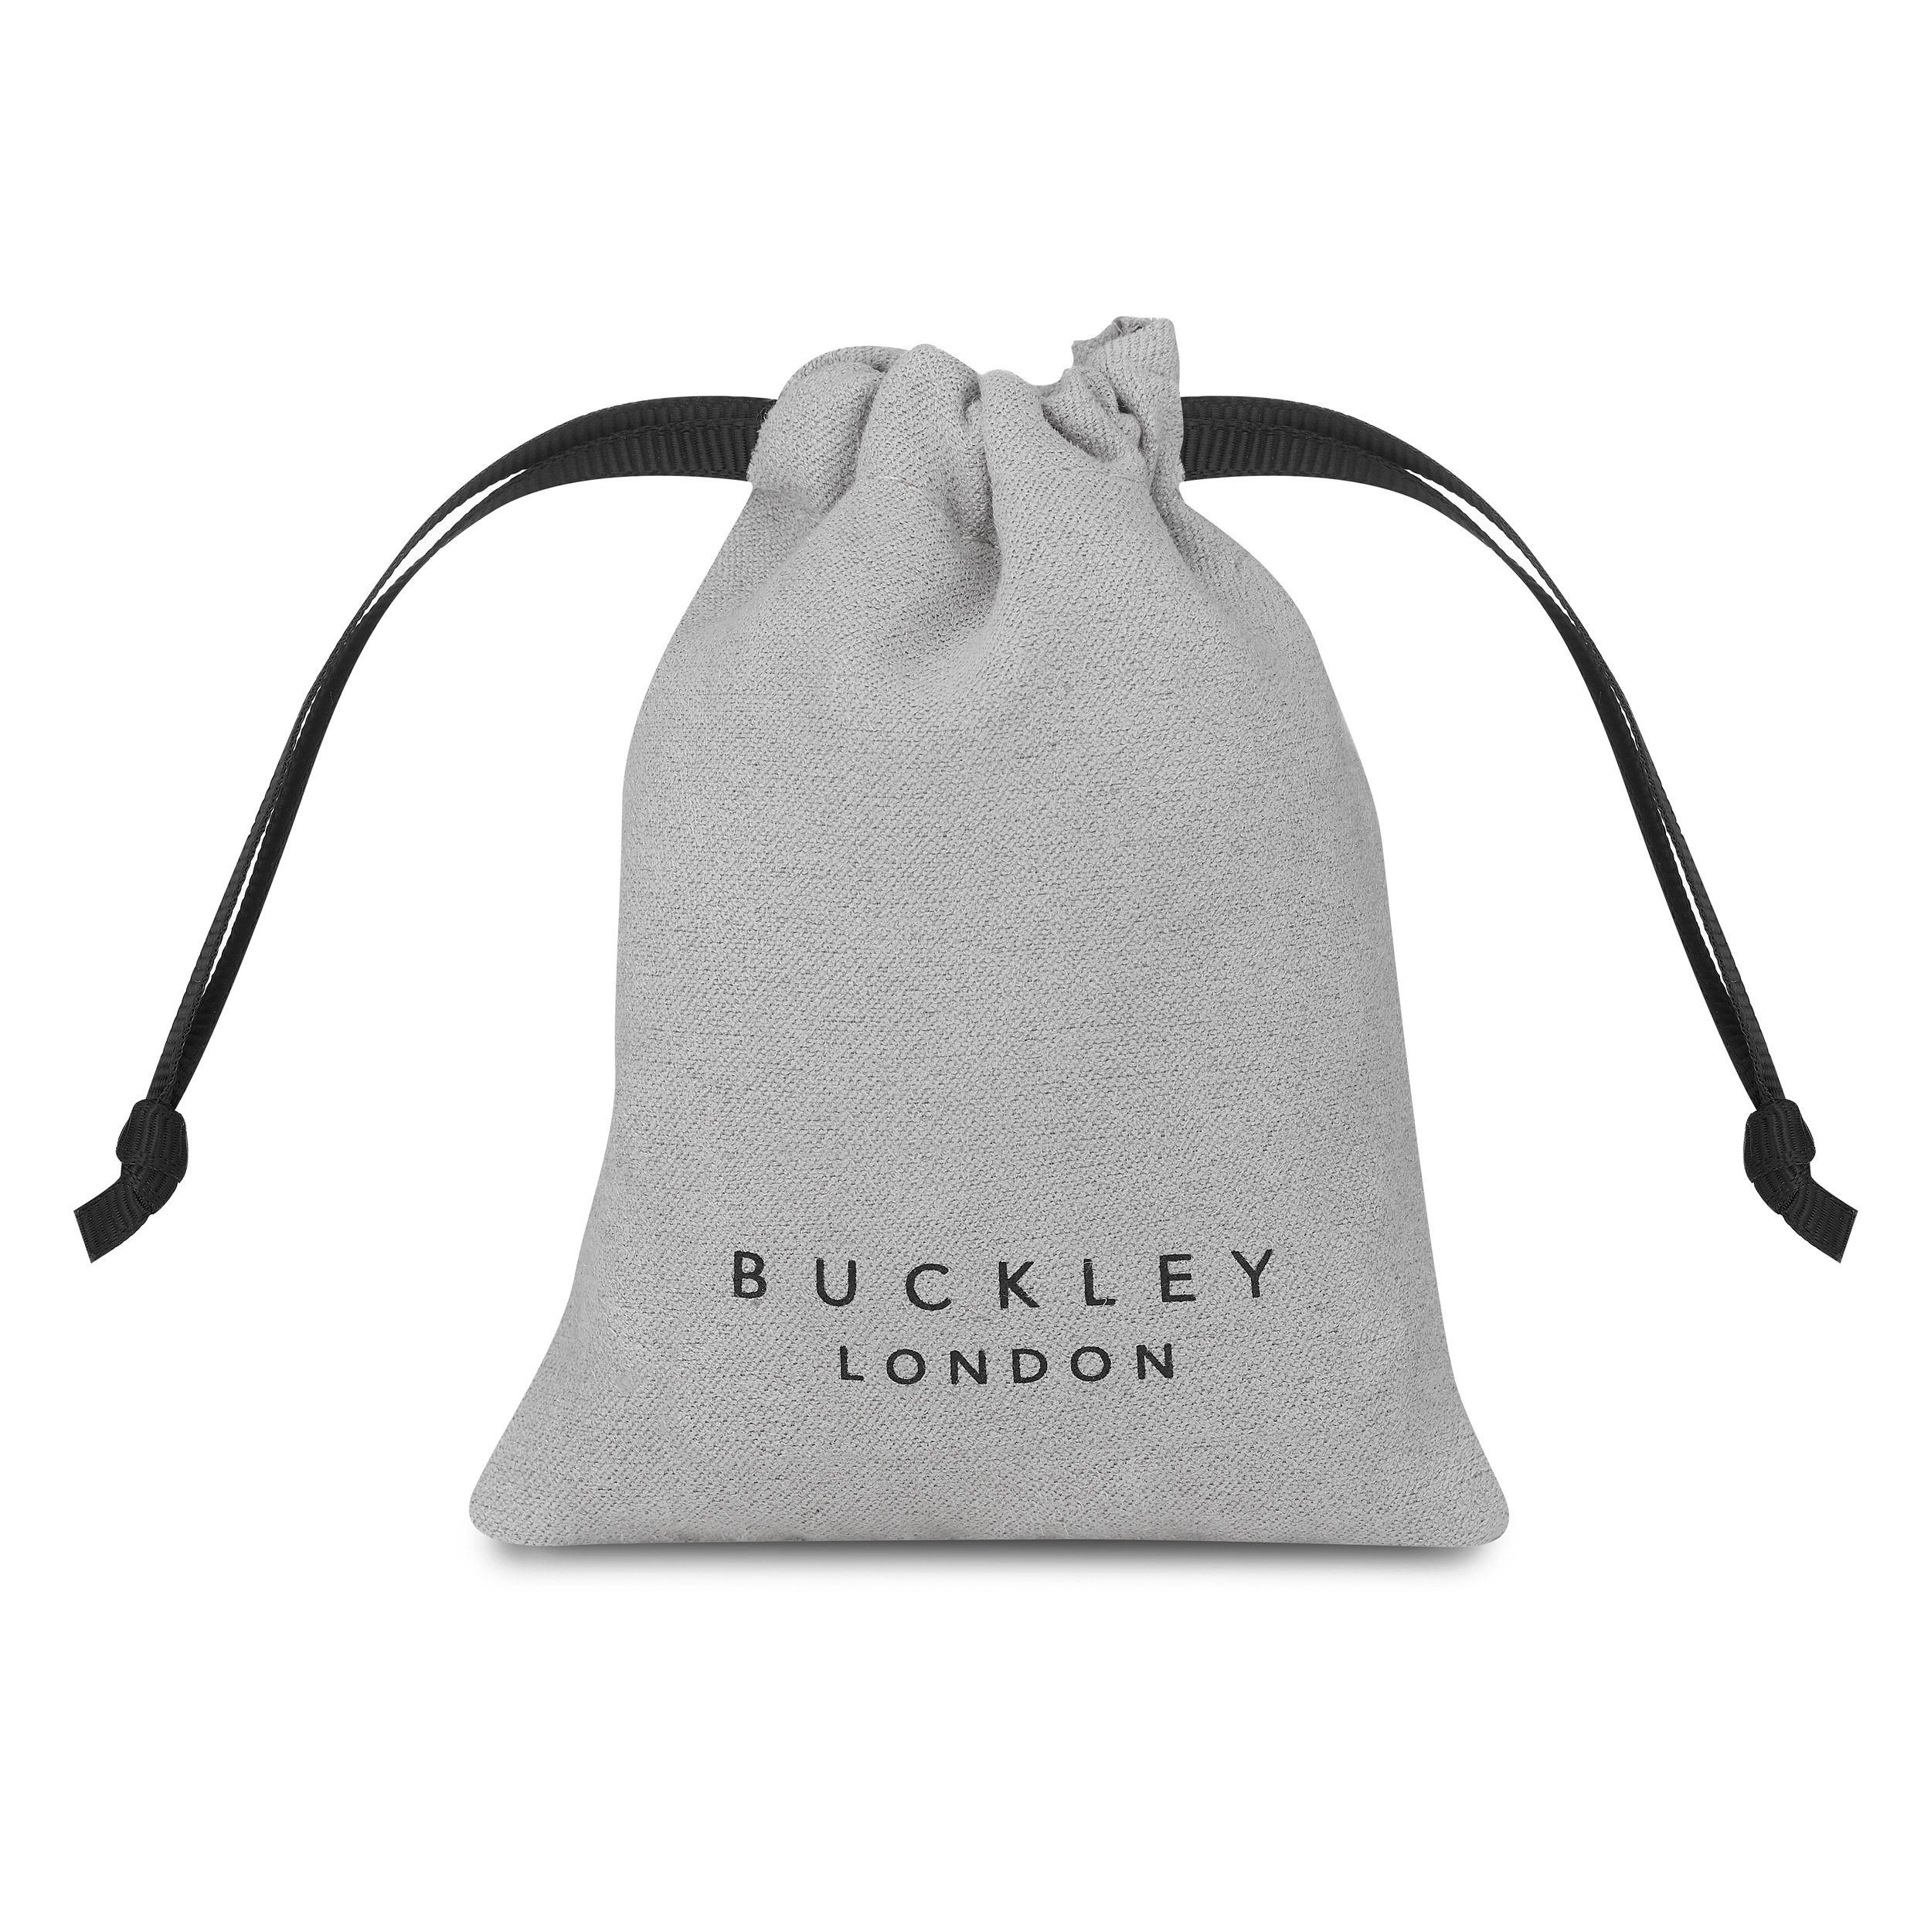 Buckley London Stellar Bangle - Rainbow Bag